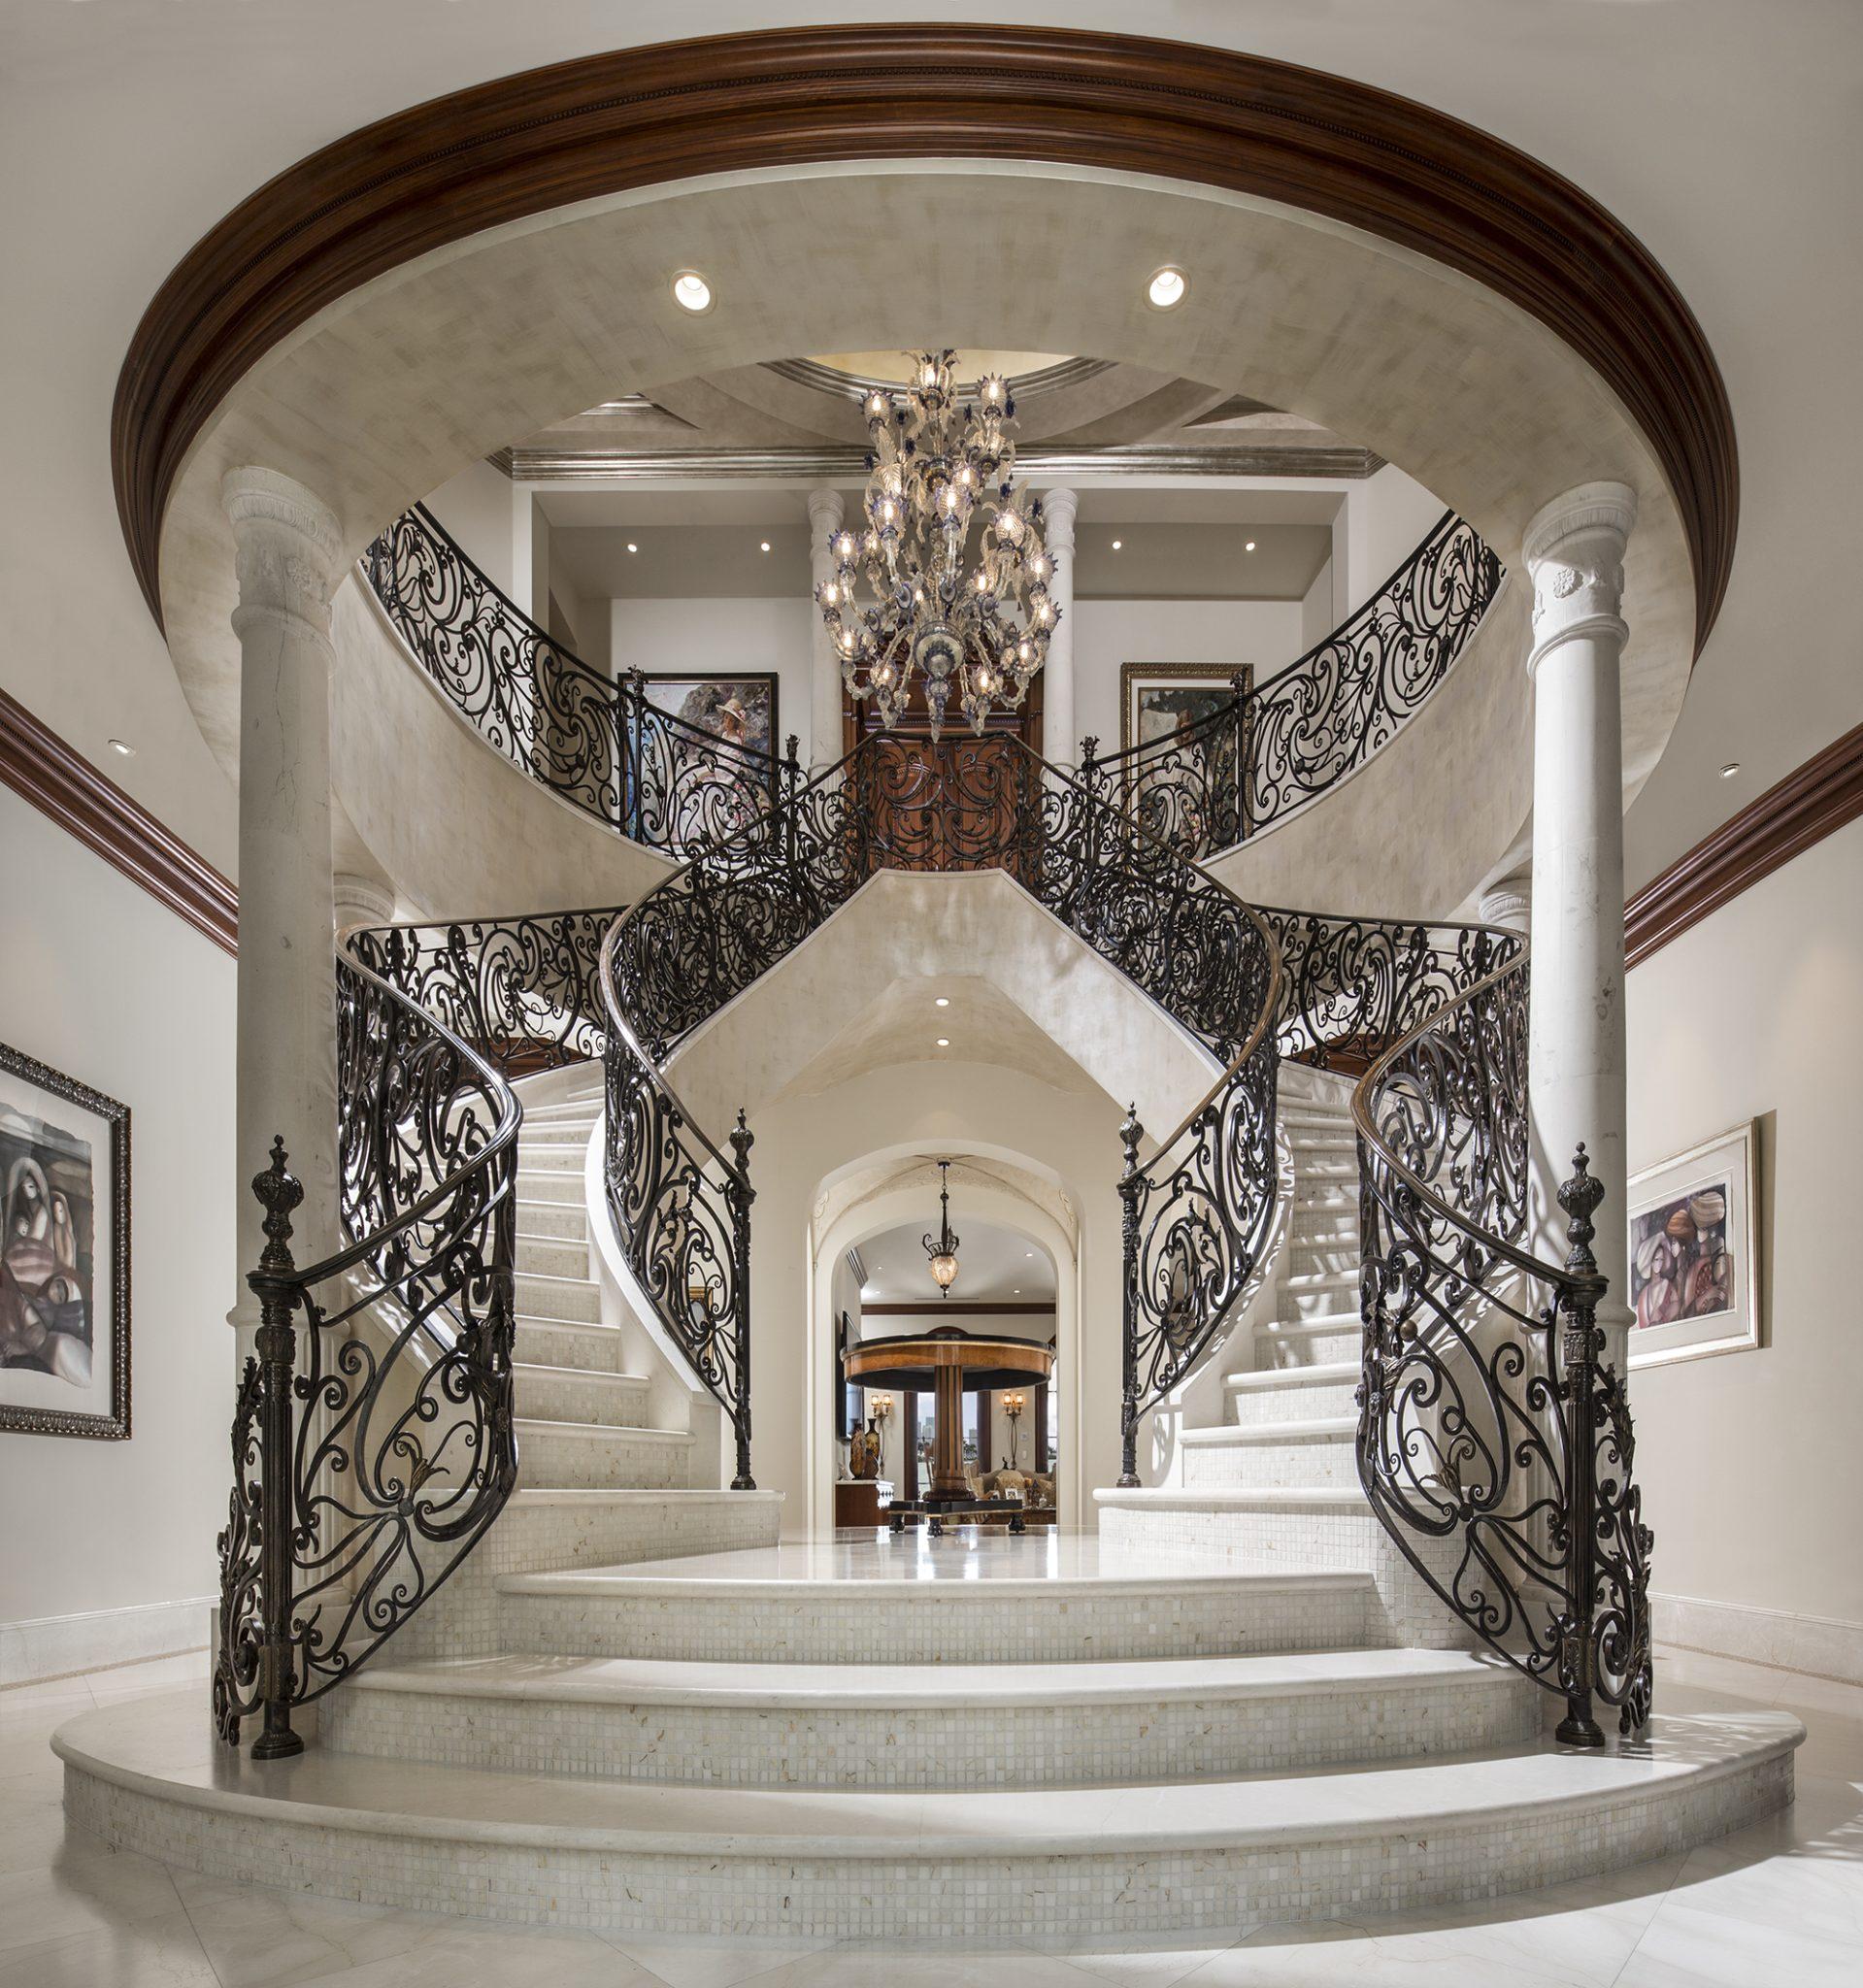 KING'S PALACE Star Island Miami Florida, Grand Stairway by Perla Lichi Design